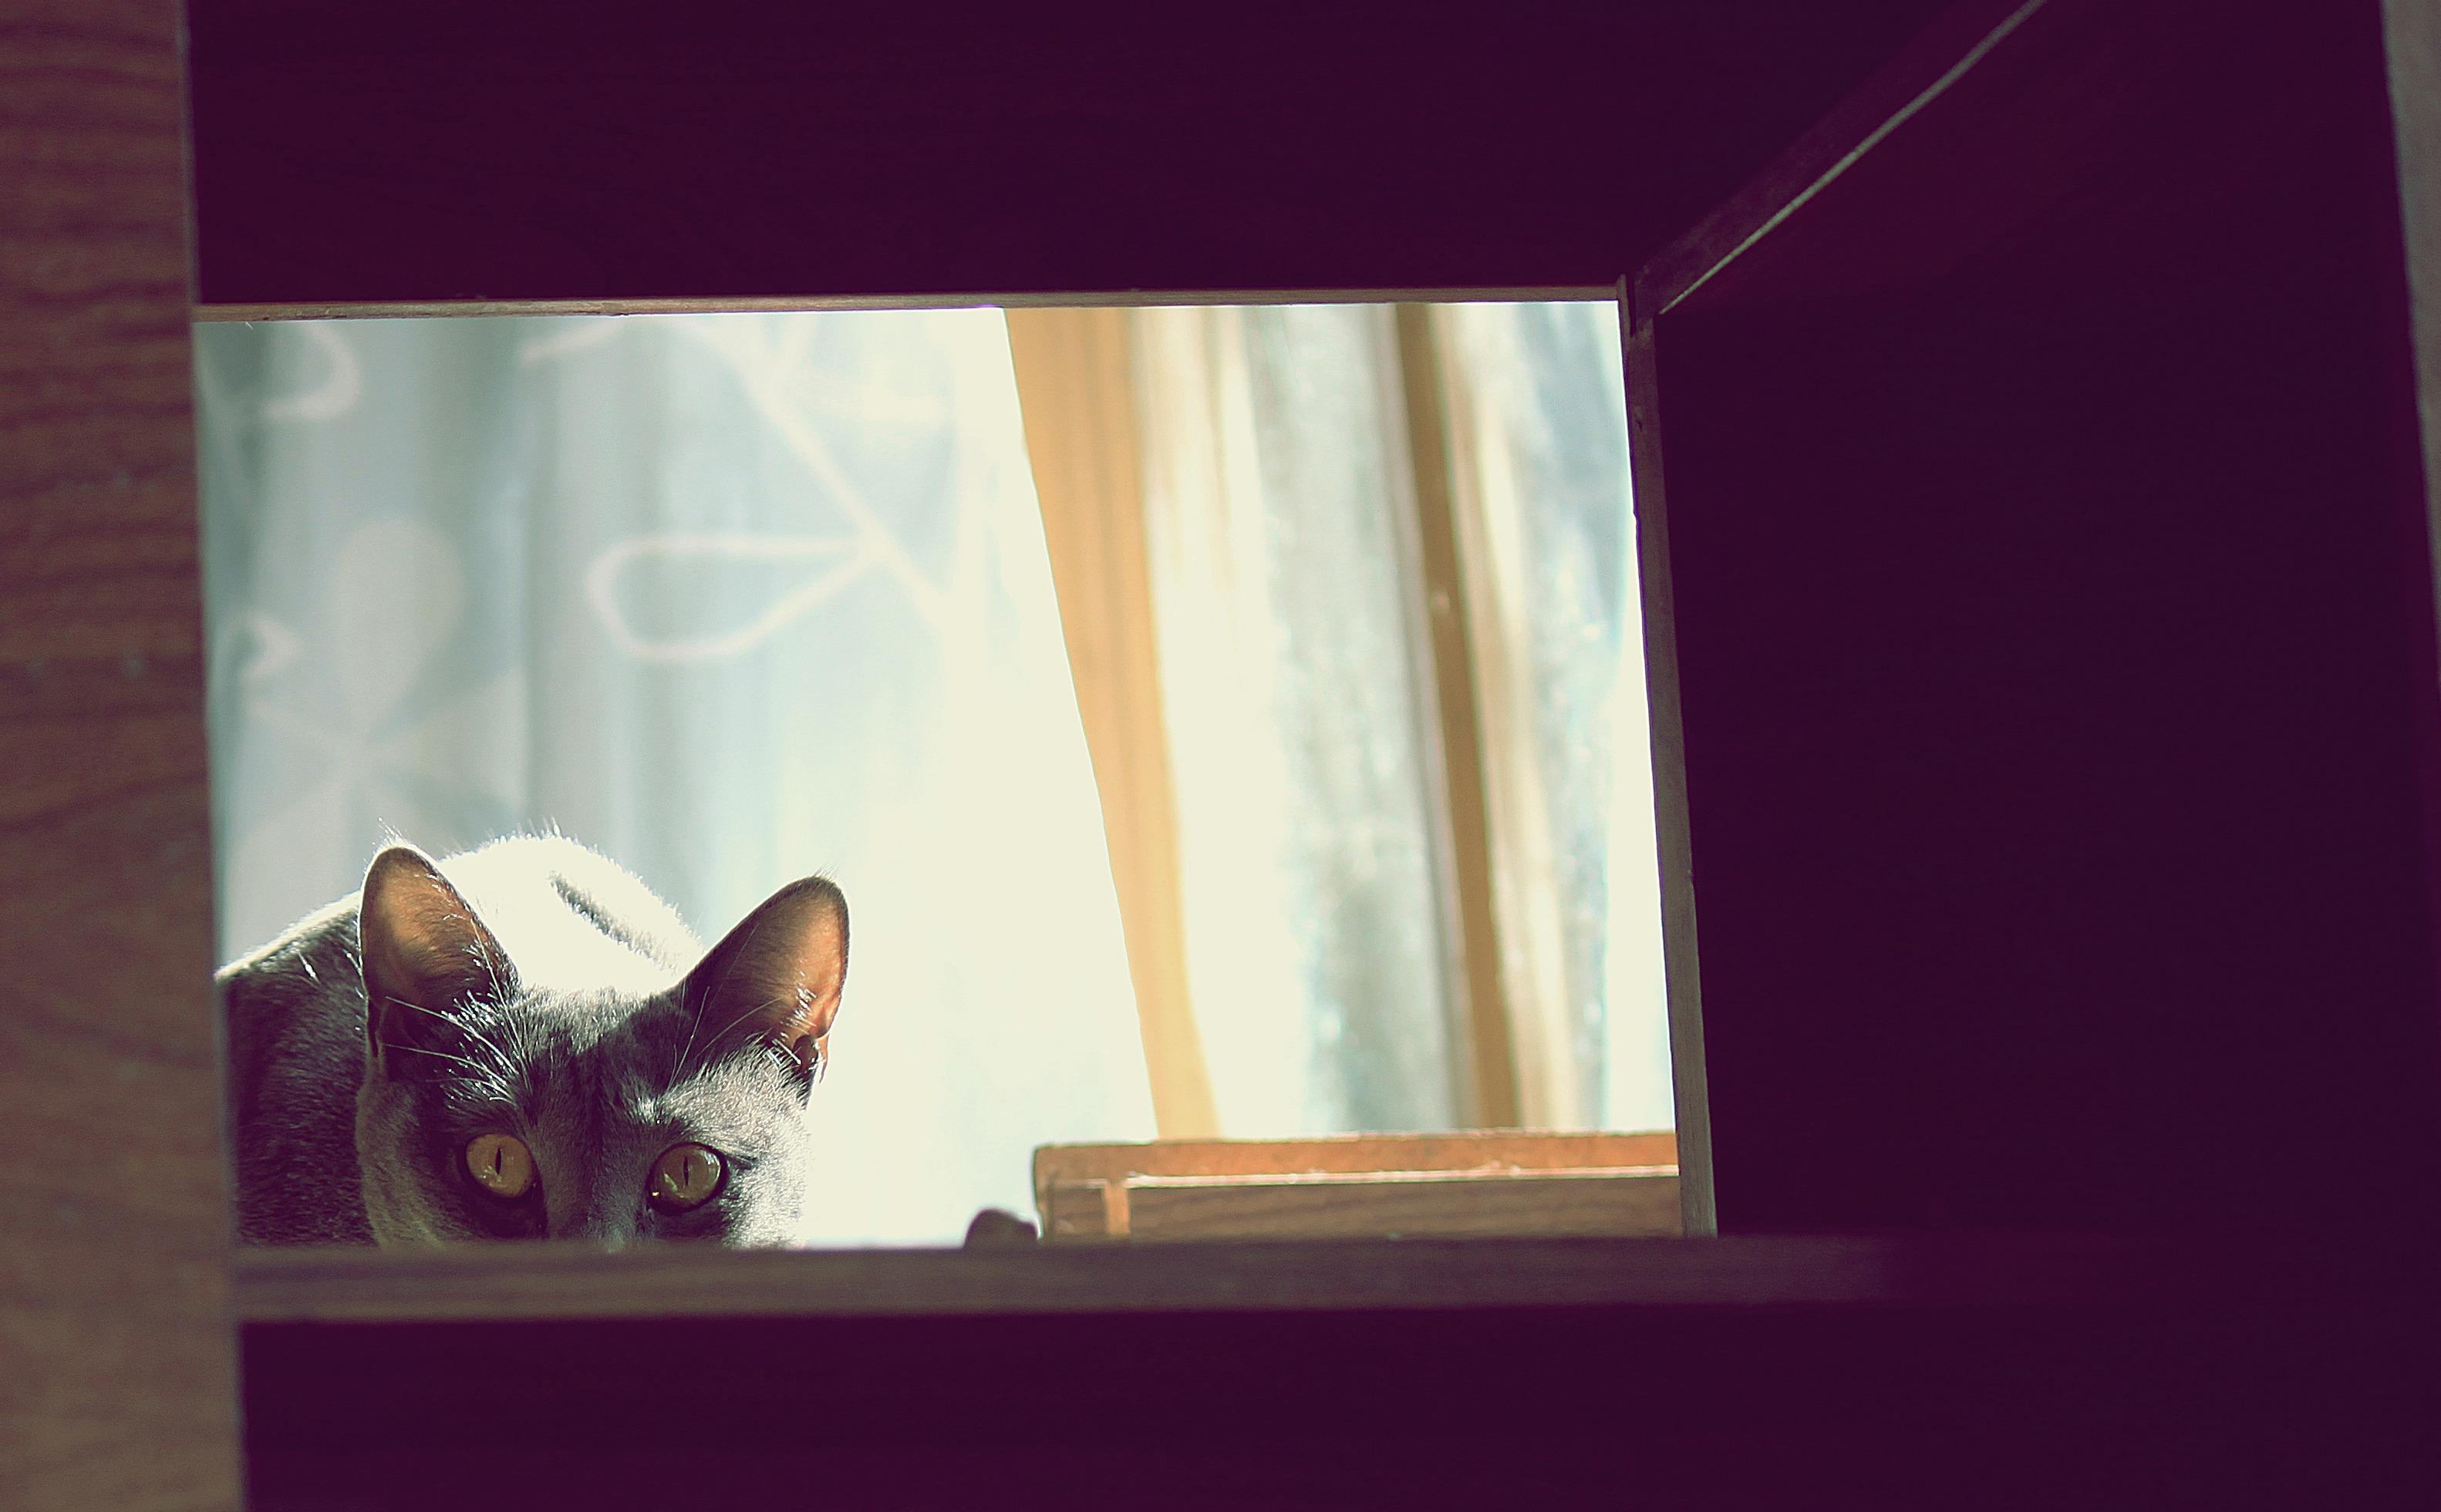 Kostenlose foto : Katze, Farbe, katzenartig, Innenarchitektur ...